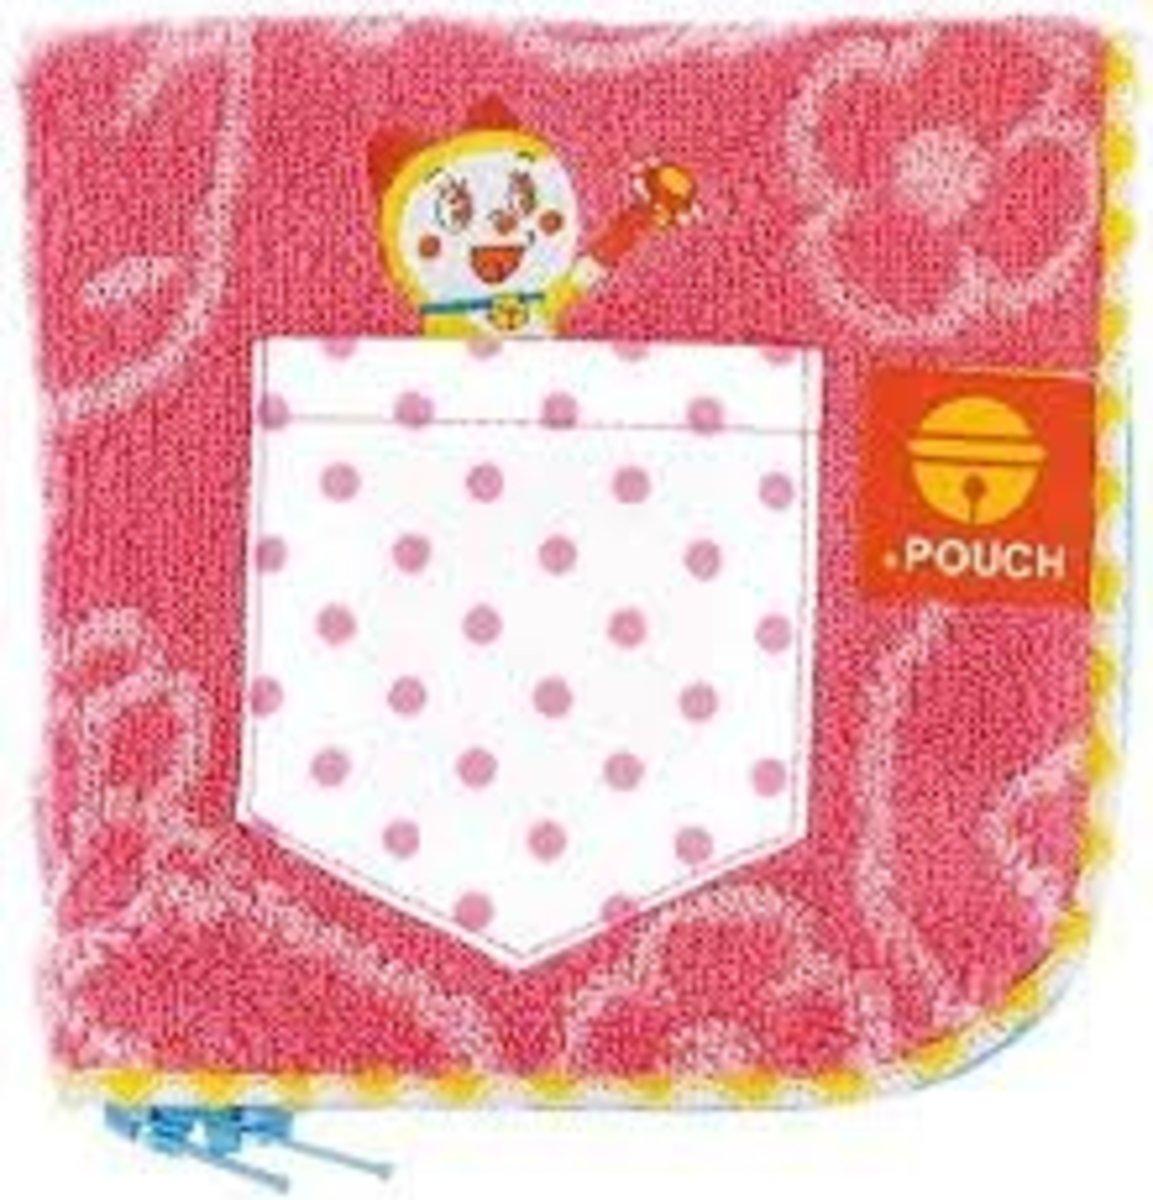 (Doraemi) Japan Multi-function Towel Pouch for Umbrella/Water Bottle